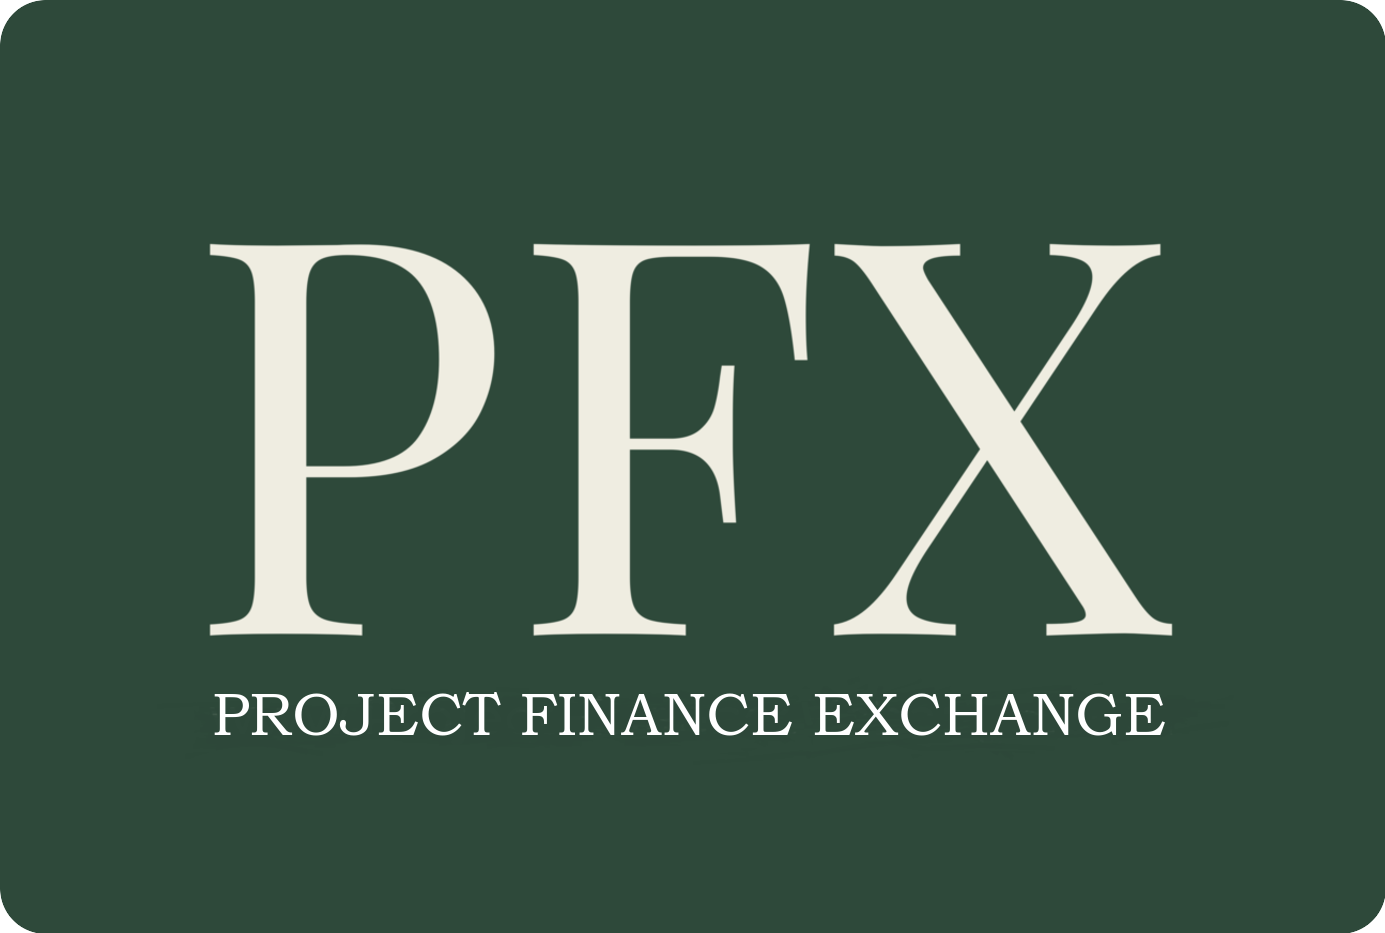 Project Finance Exchange Logo